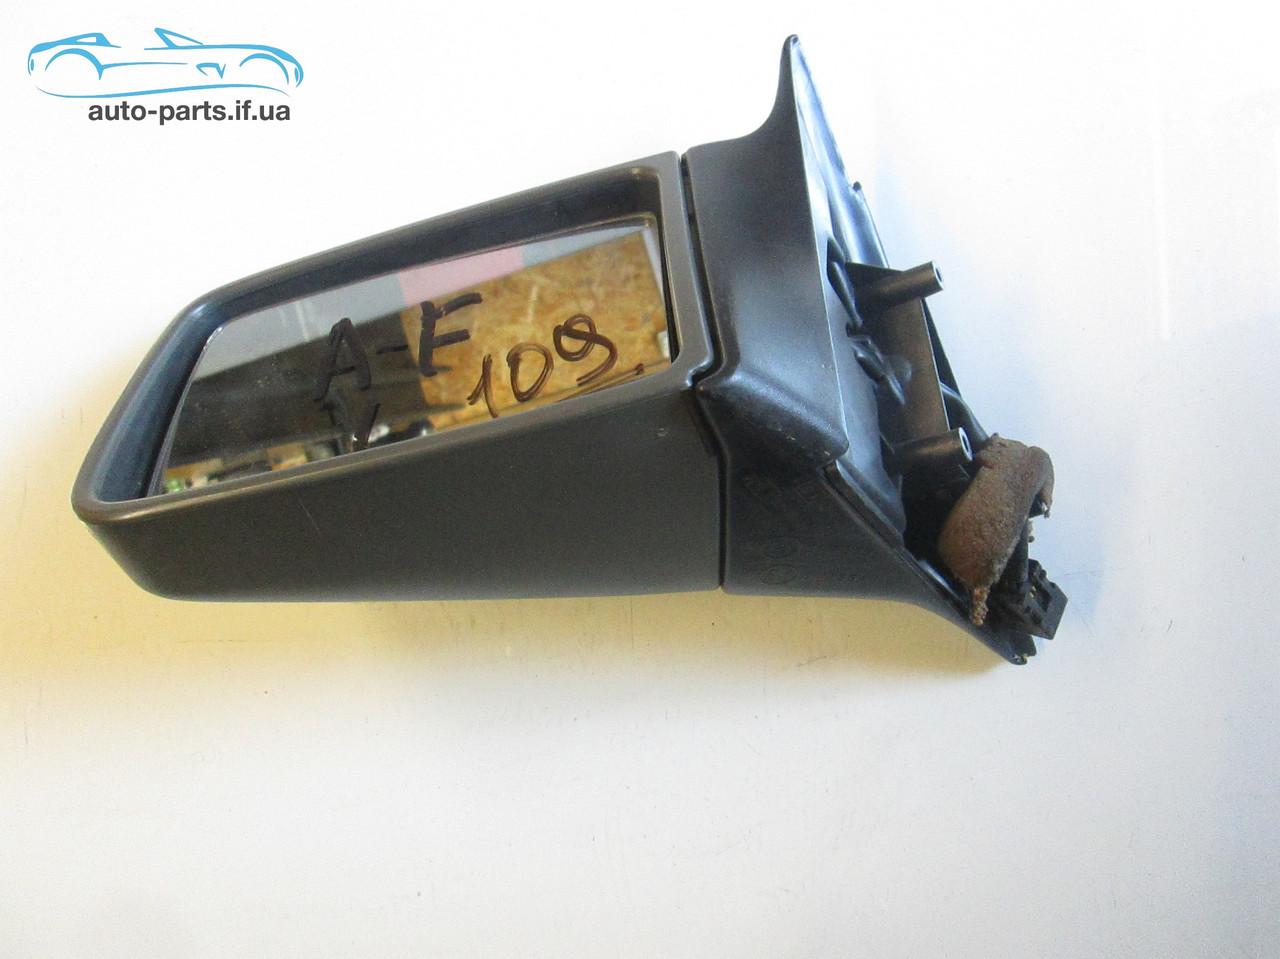 Зеркало правое Opel Astra F електрическое №109